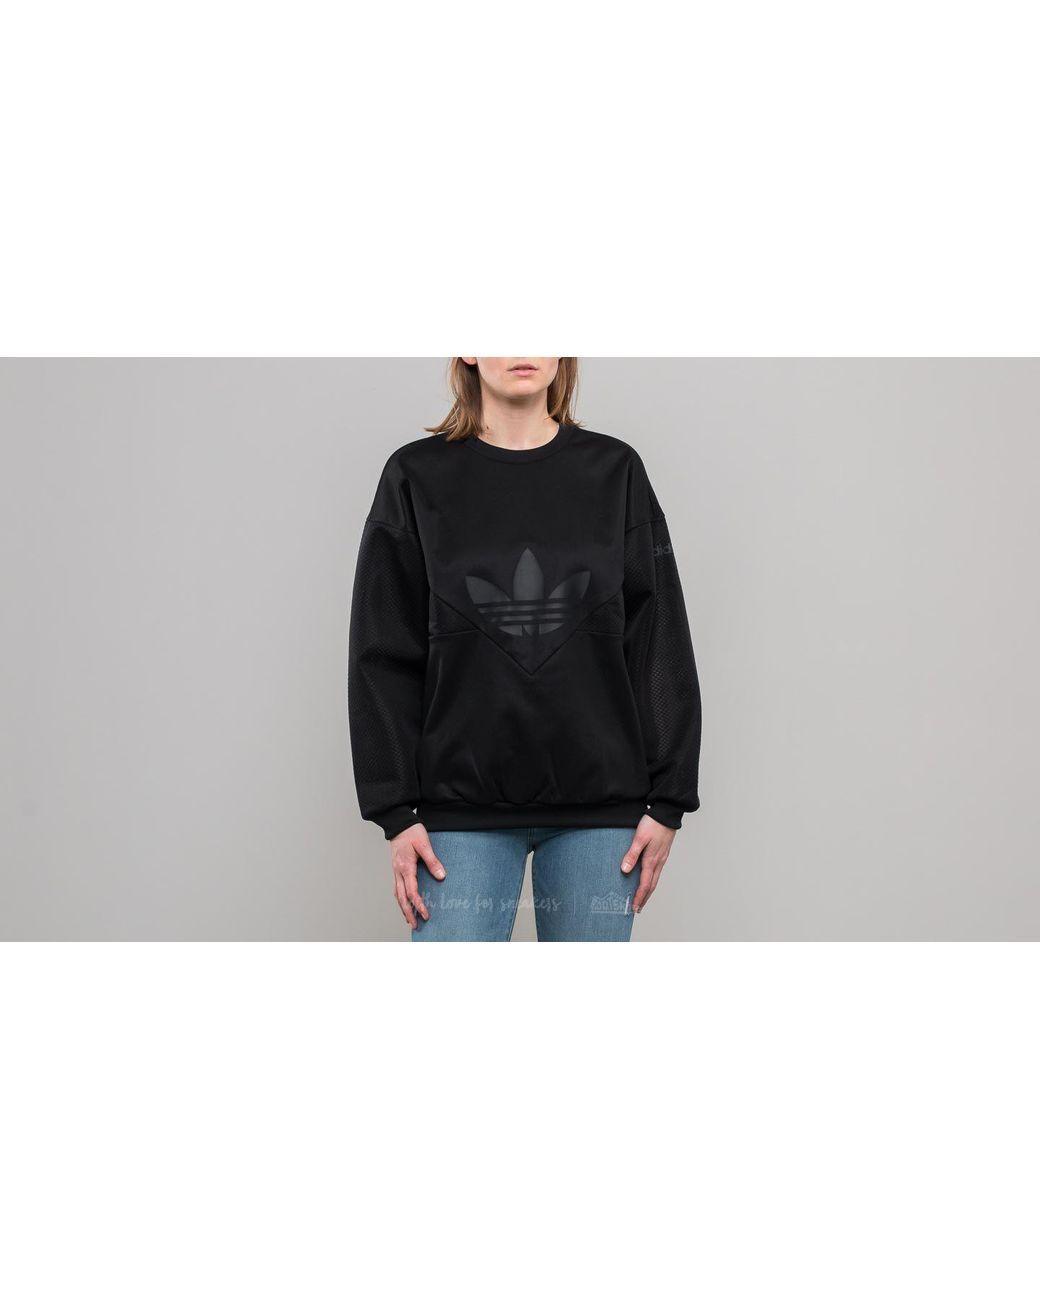 eb28f408ca0e94 Adidas Originals - Adidas Colorado Sweatshirt Black - Lyst